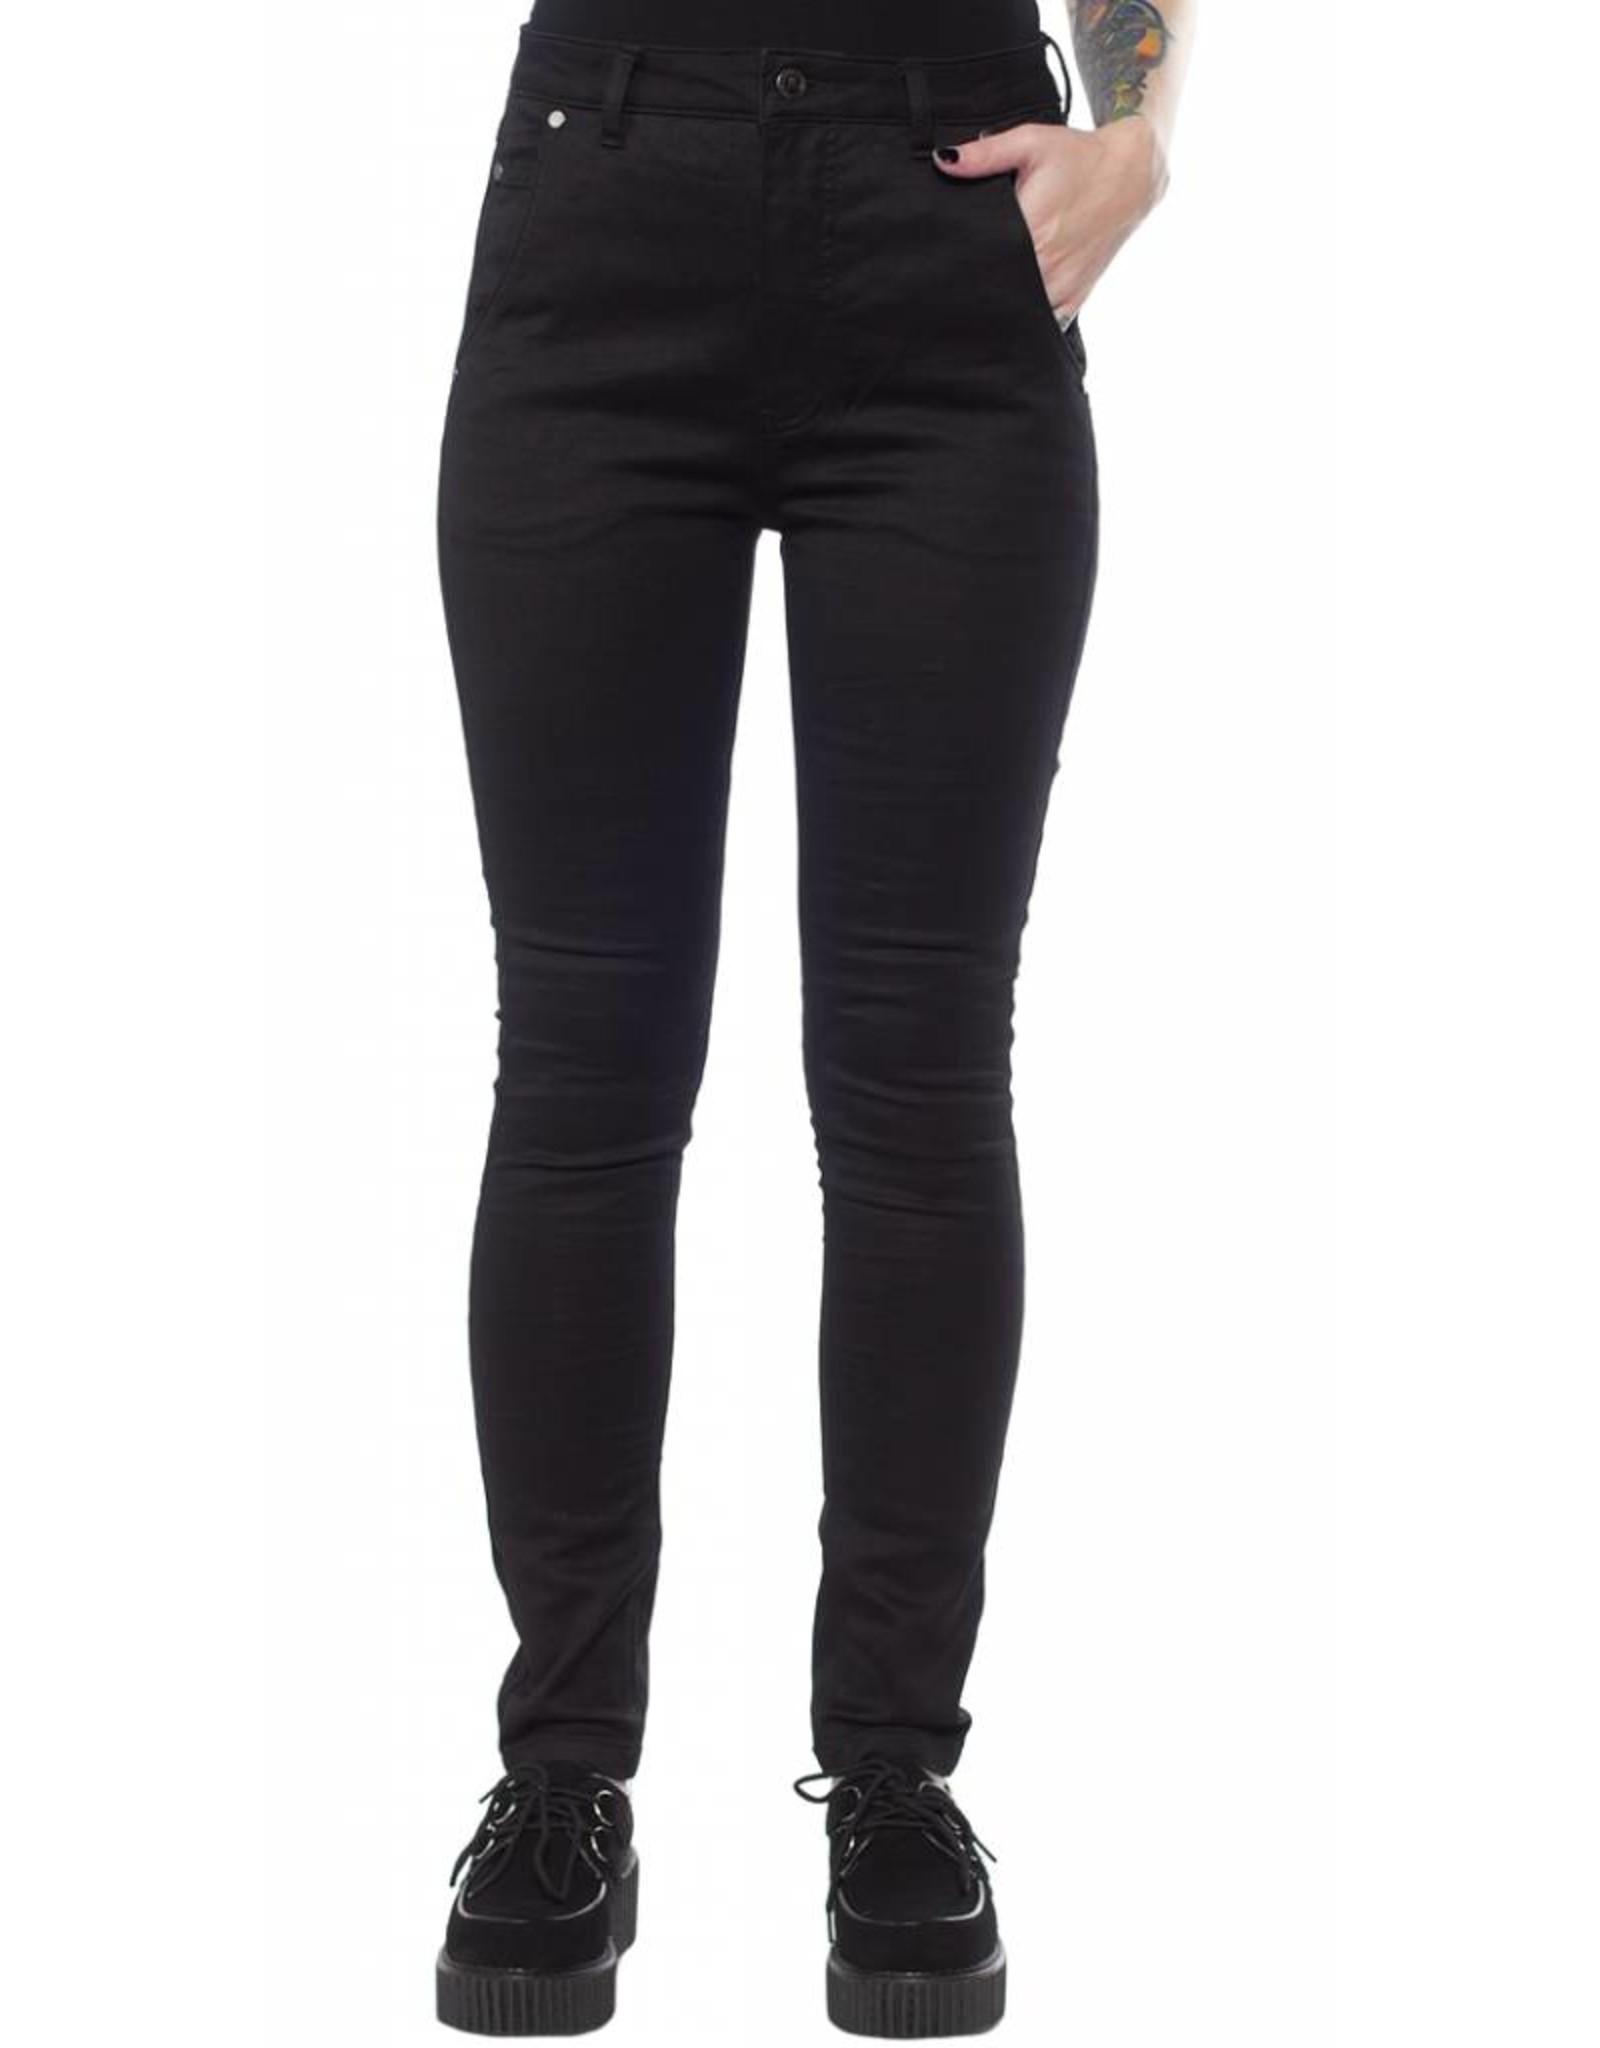 SOURPUSS - Essential Black 5 Pocket Pants